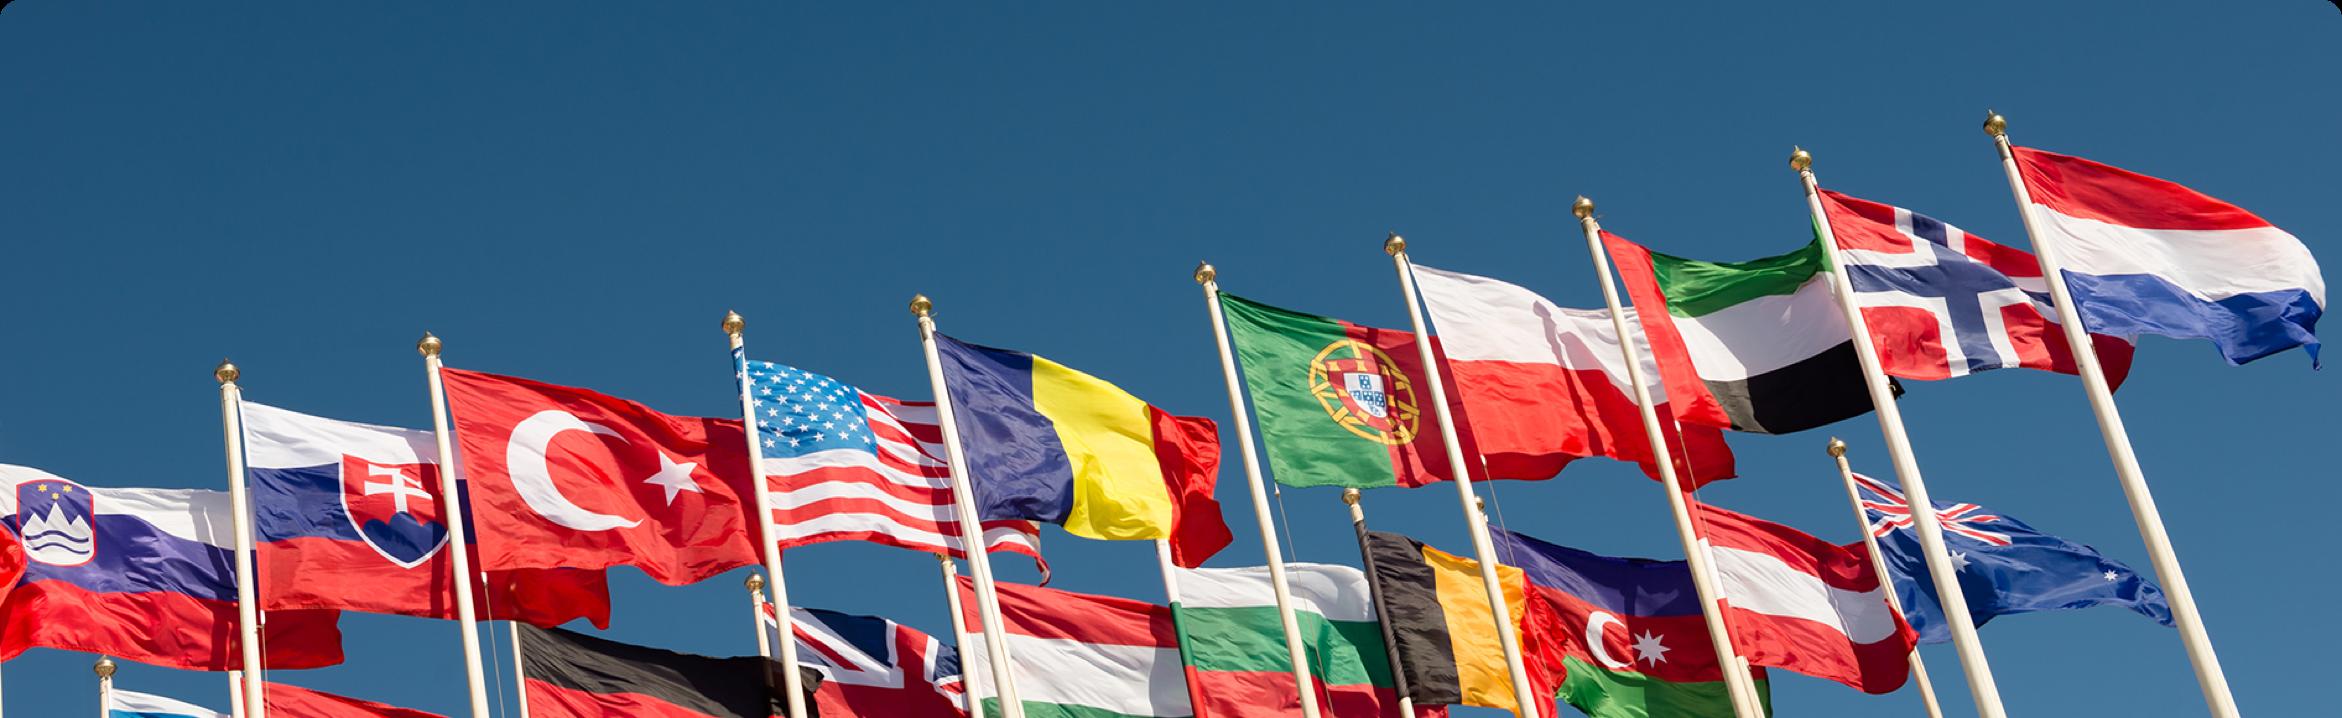 UNDP Flags